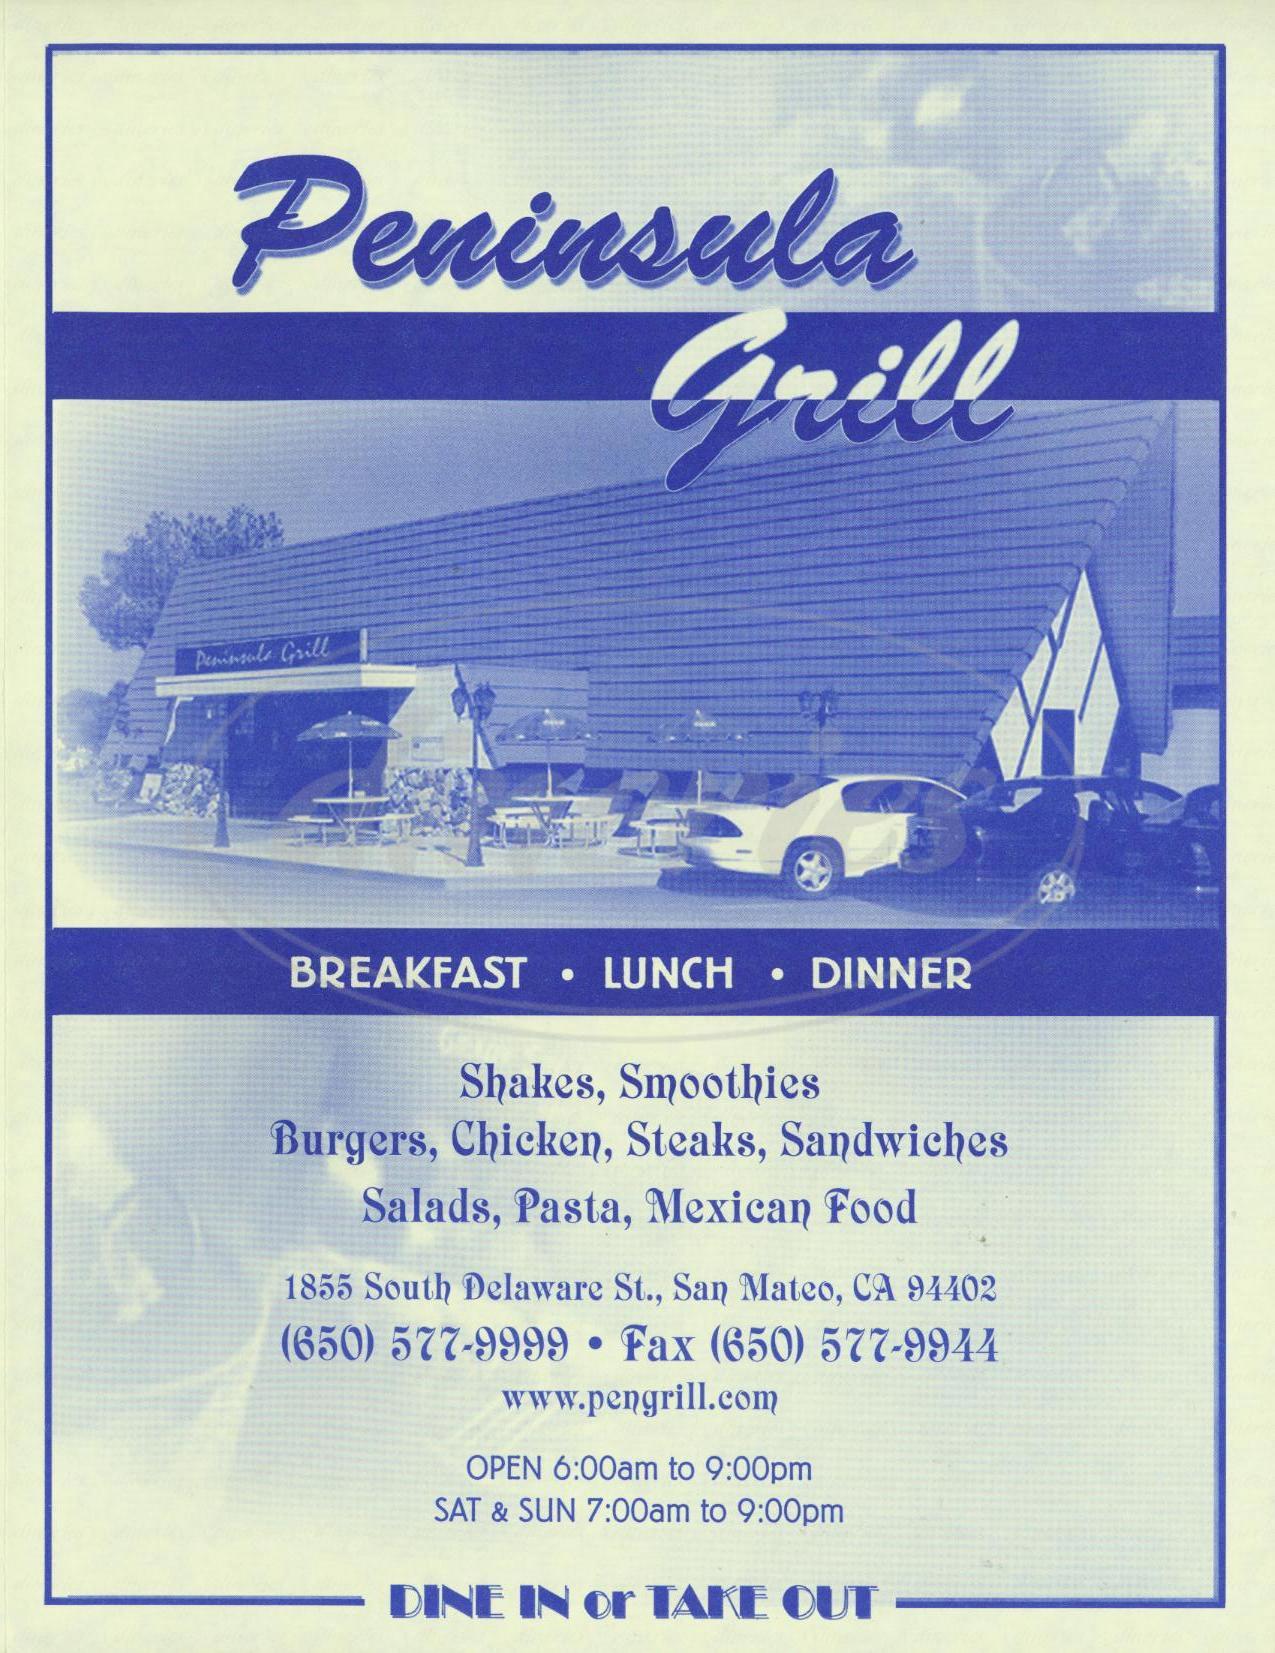 menu for Peninsula Grill